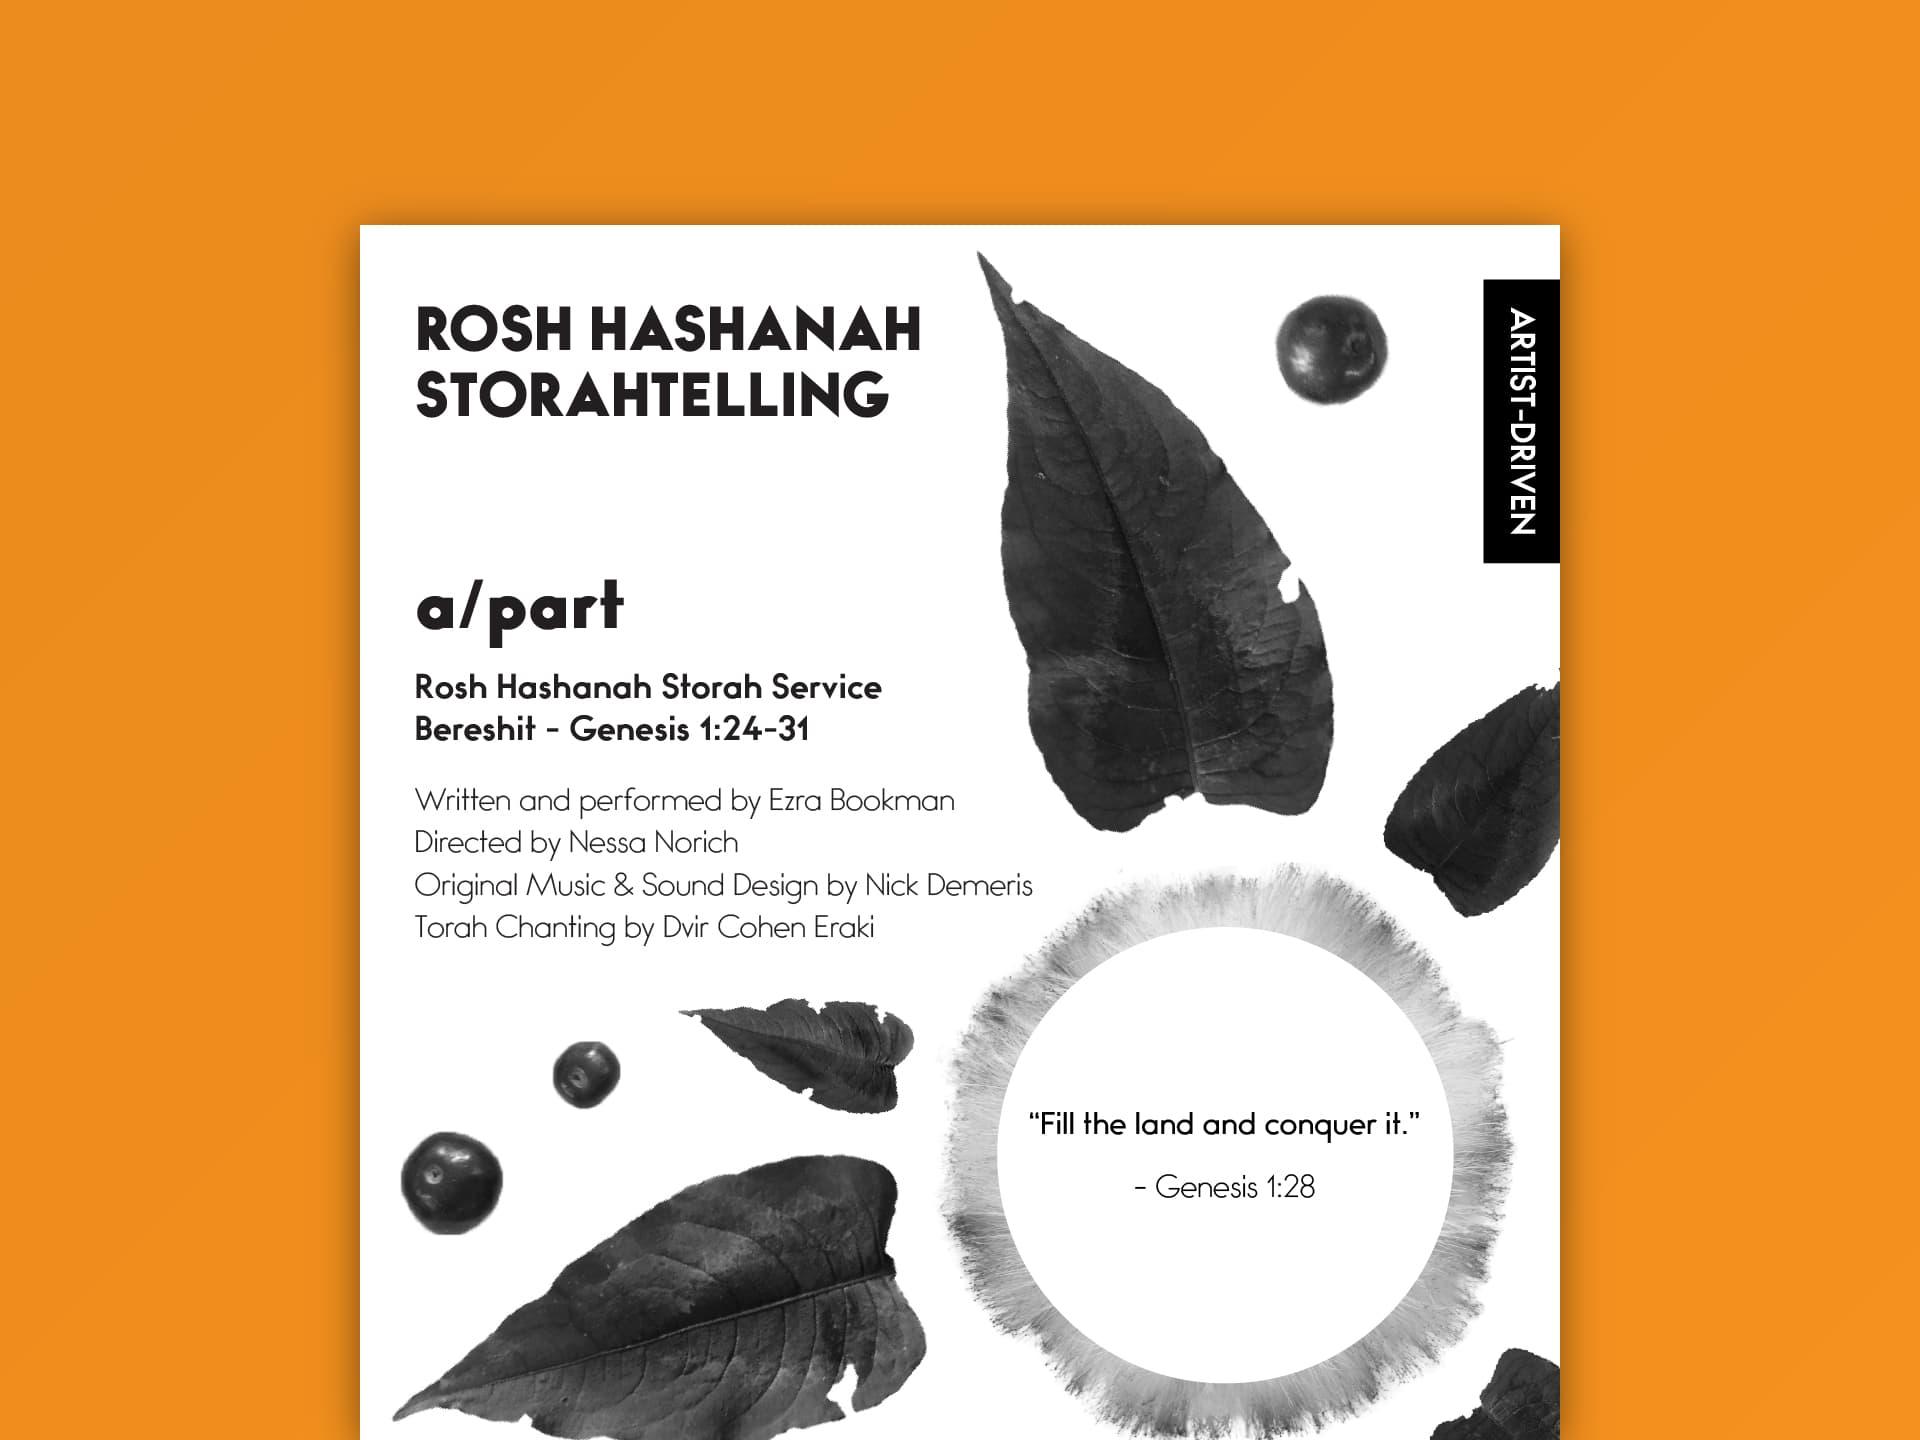 Program - Title Page